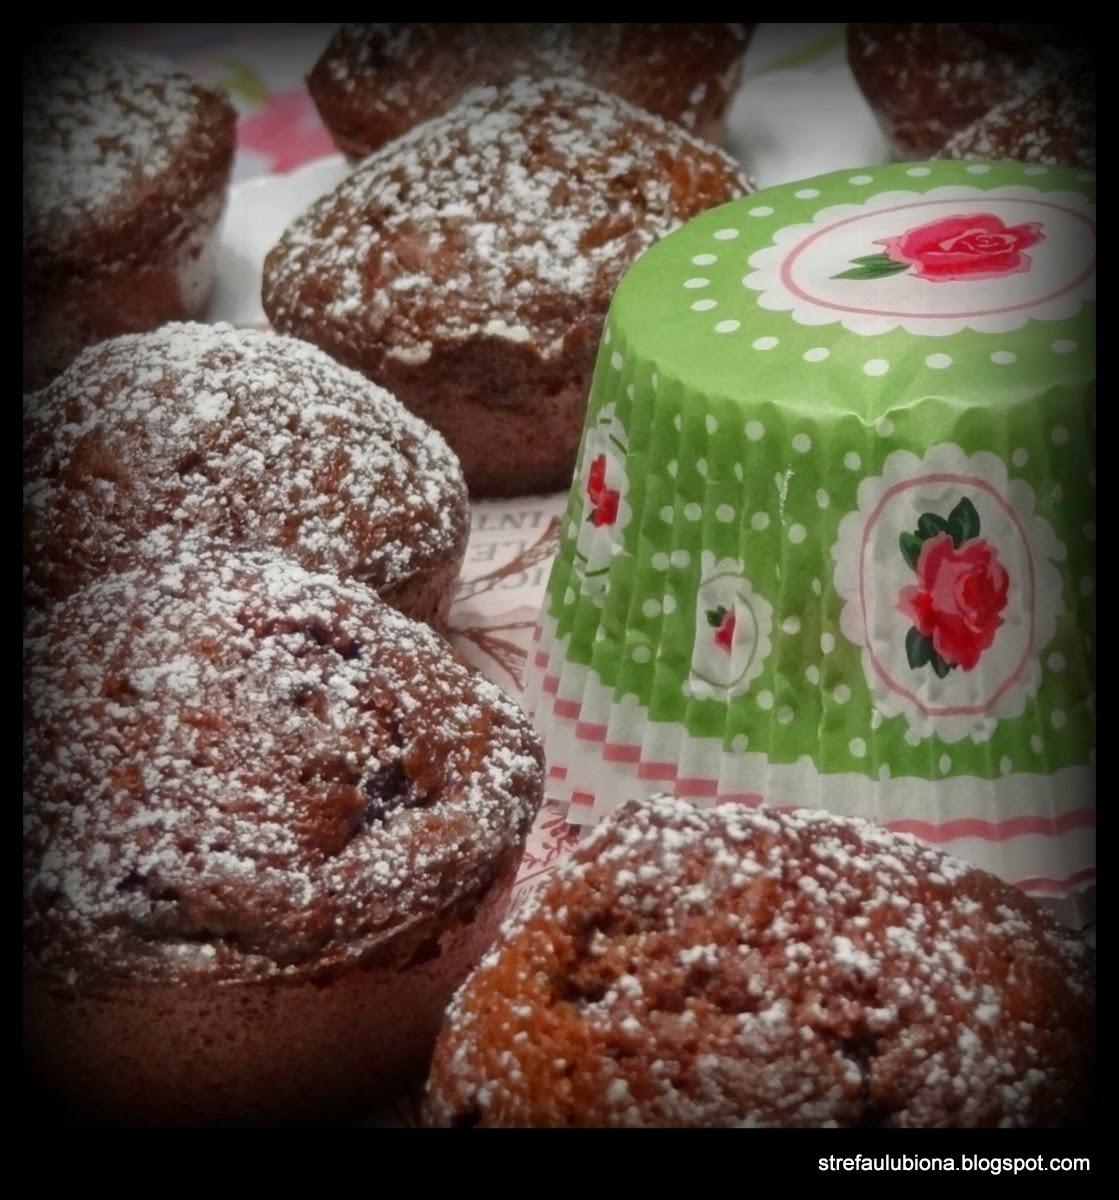 http://strefaulubiona.blogspot.com/2015/04/mini-muffiny-korzenne.html